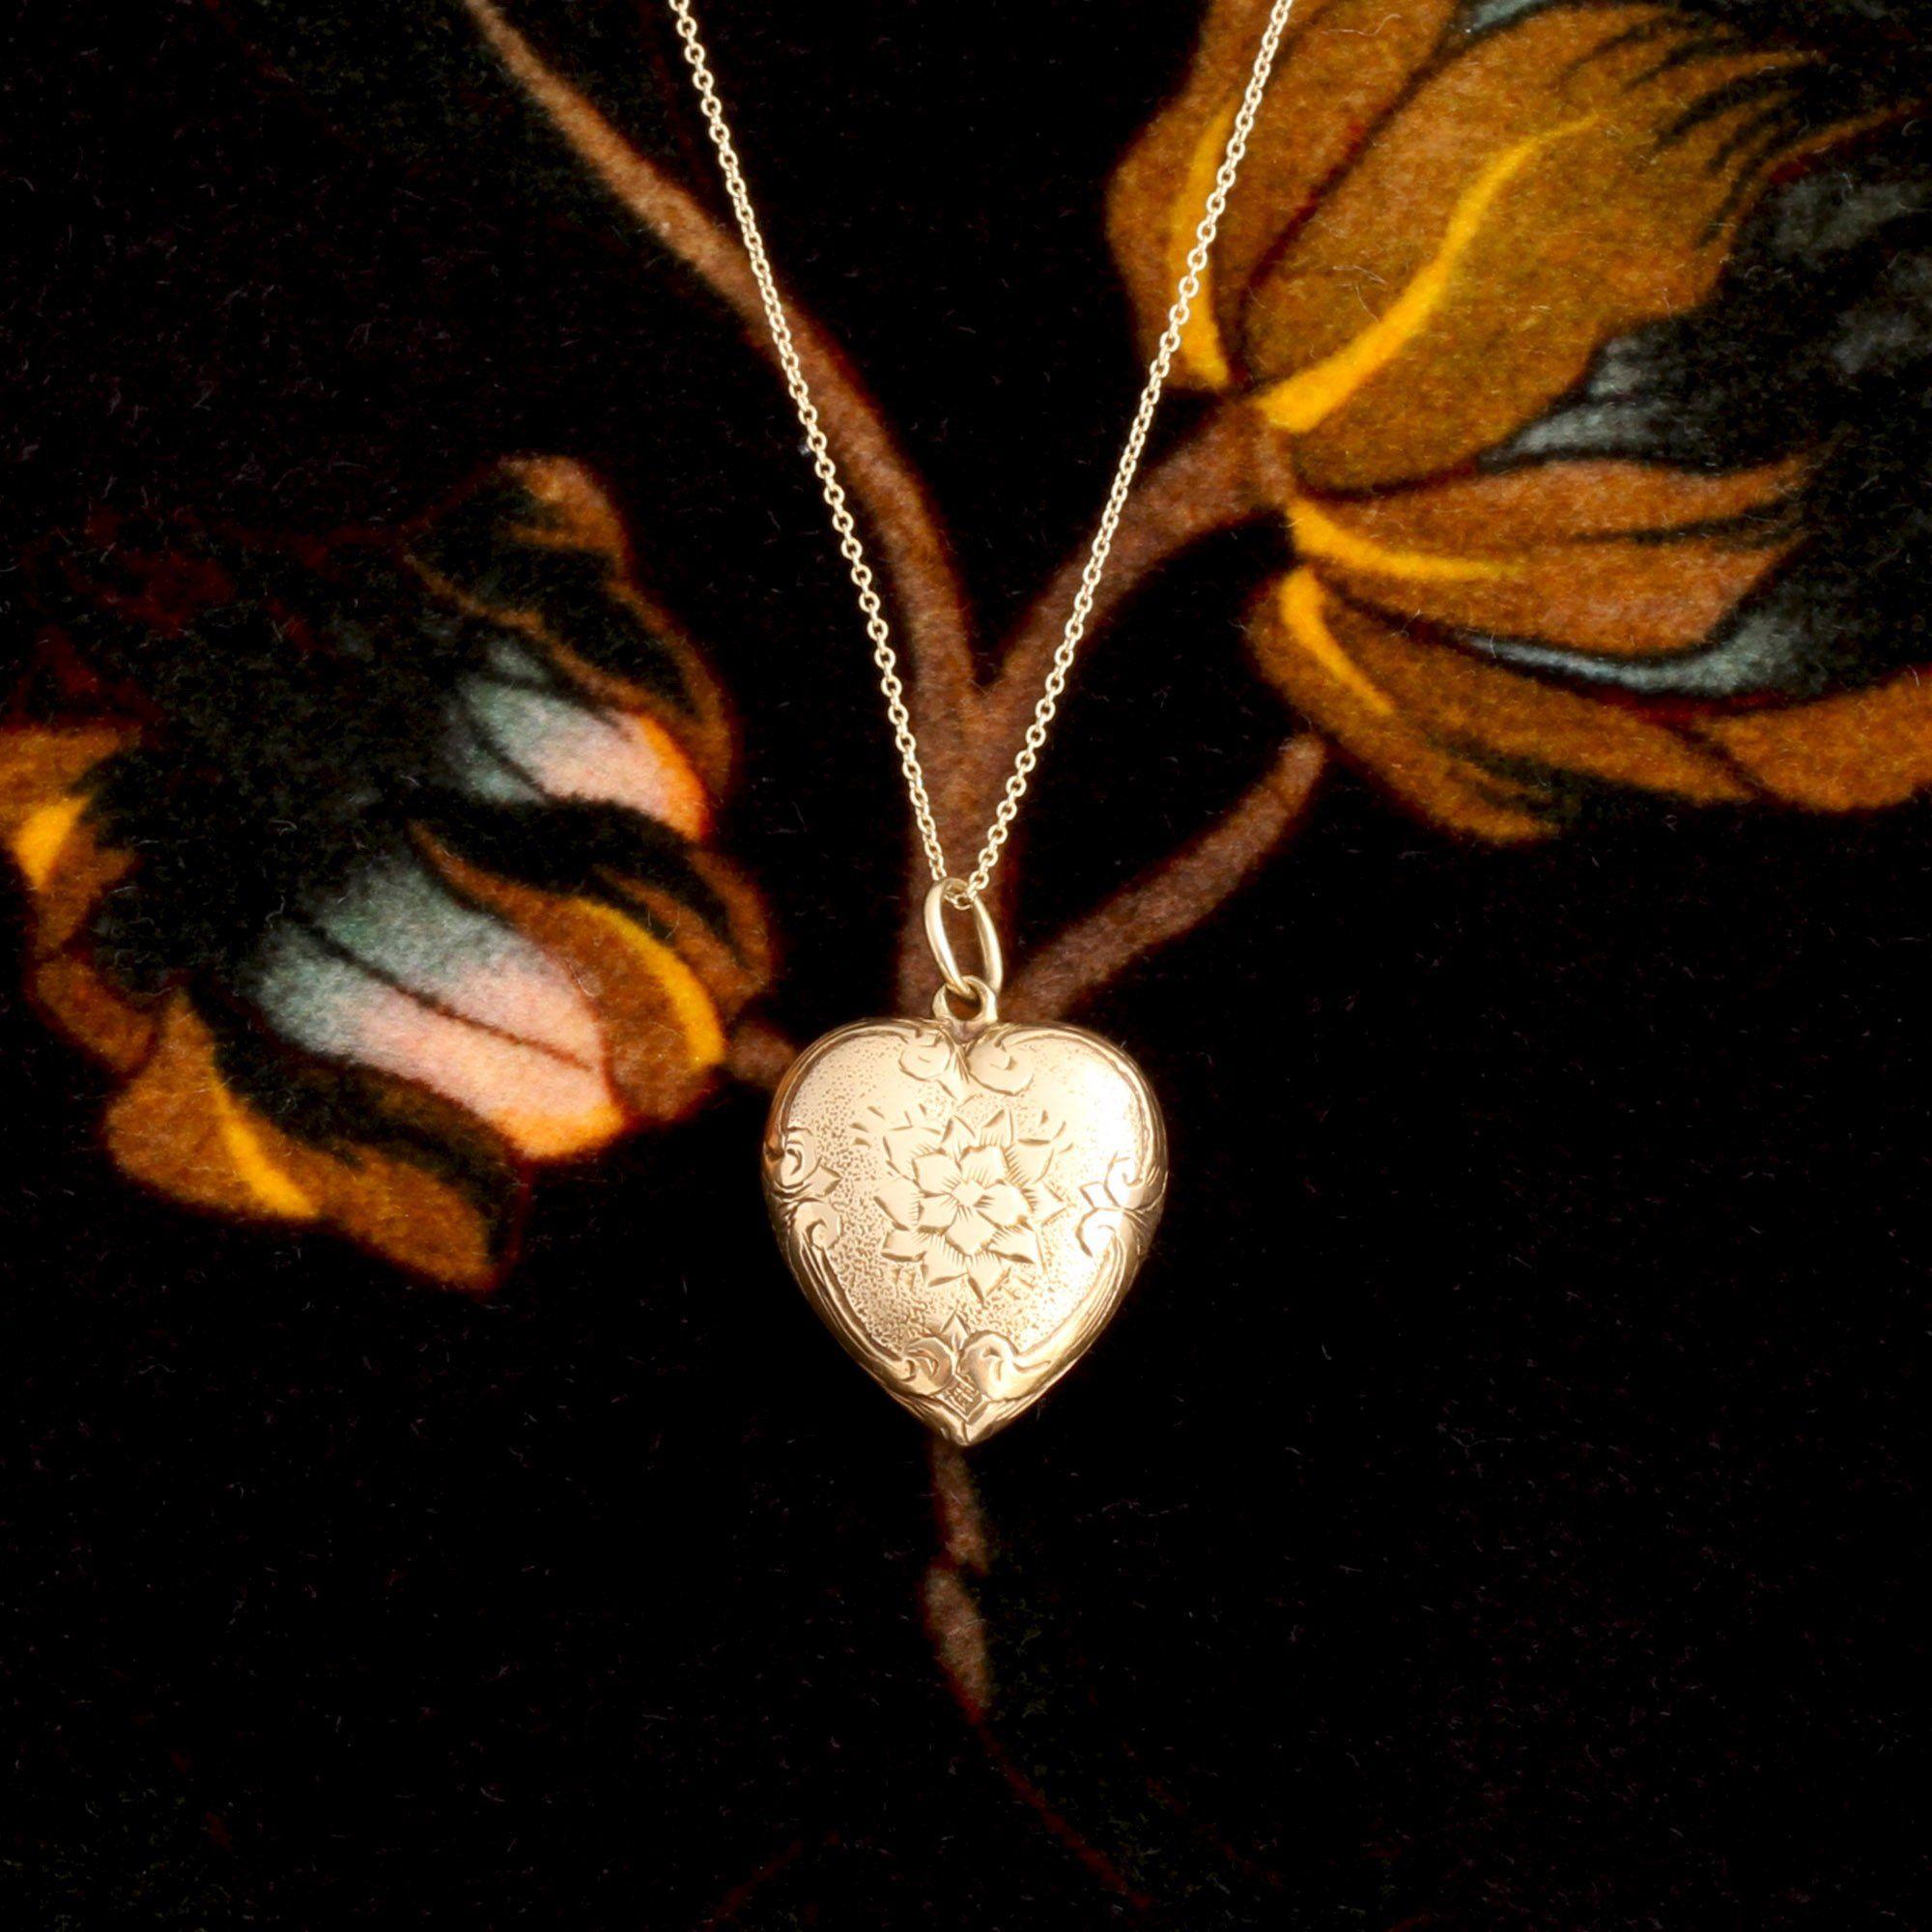 Victorian Floral Motif Heart Locket